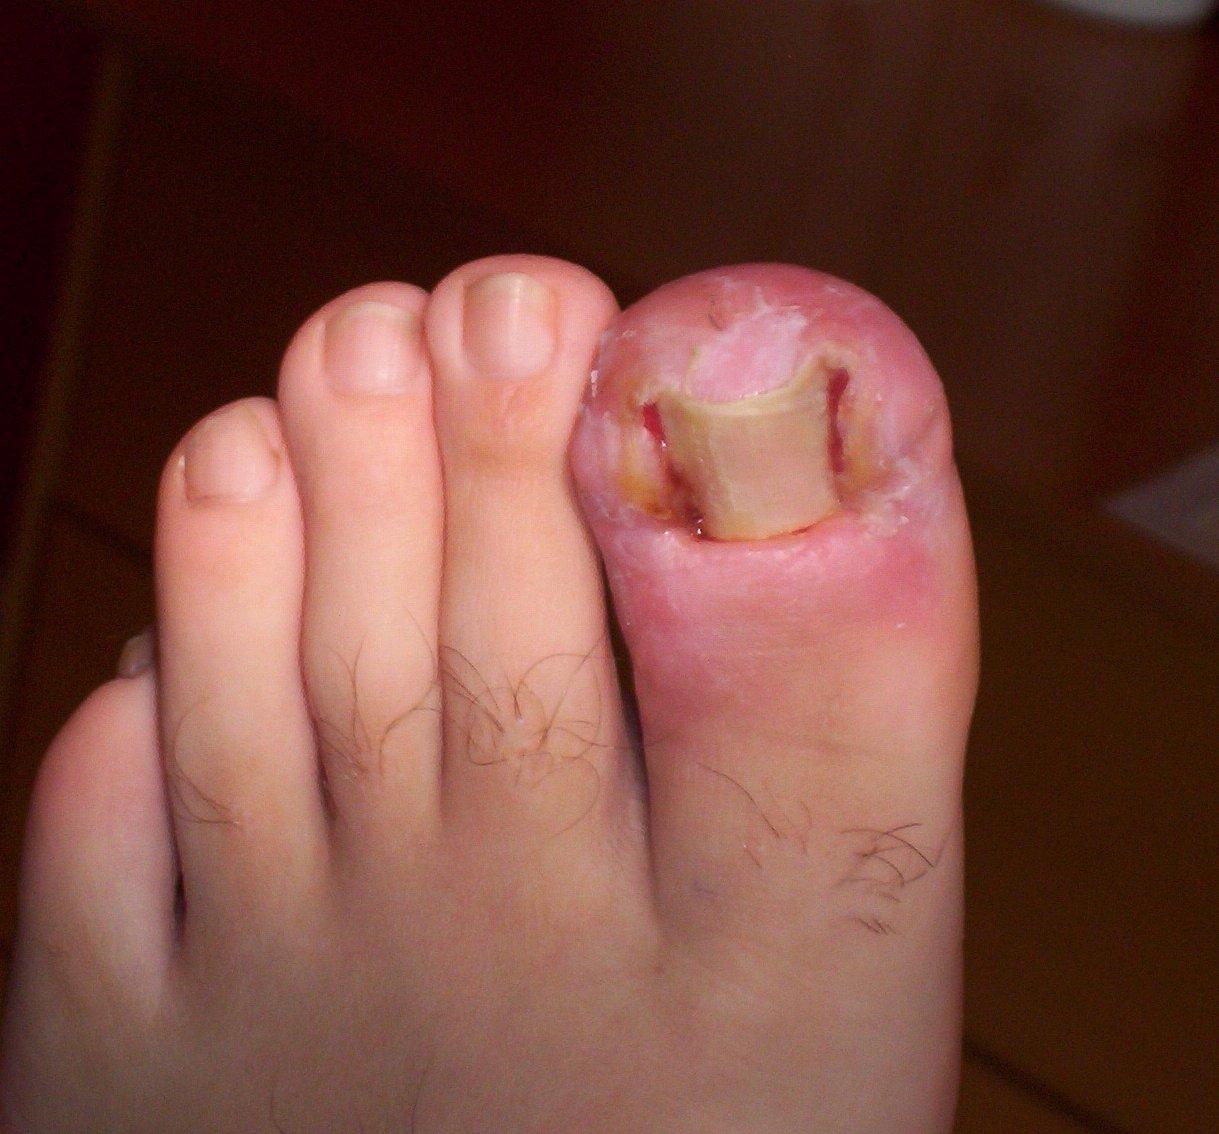 Badly Infected Ingrown Toenail Ingrown Toenails - Top...